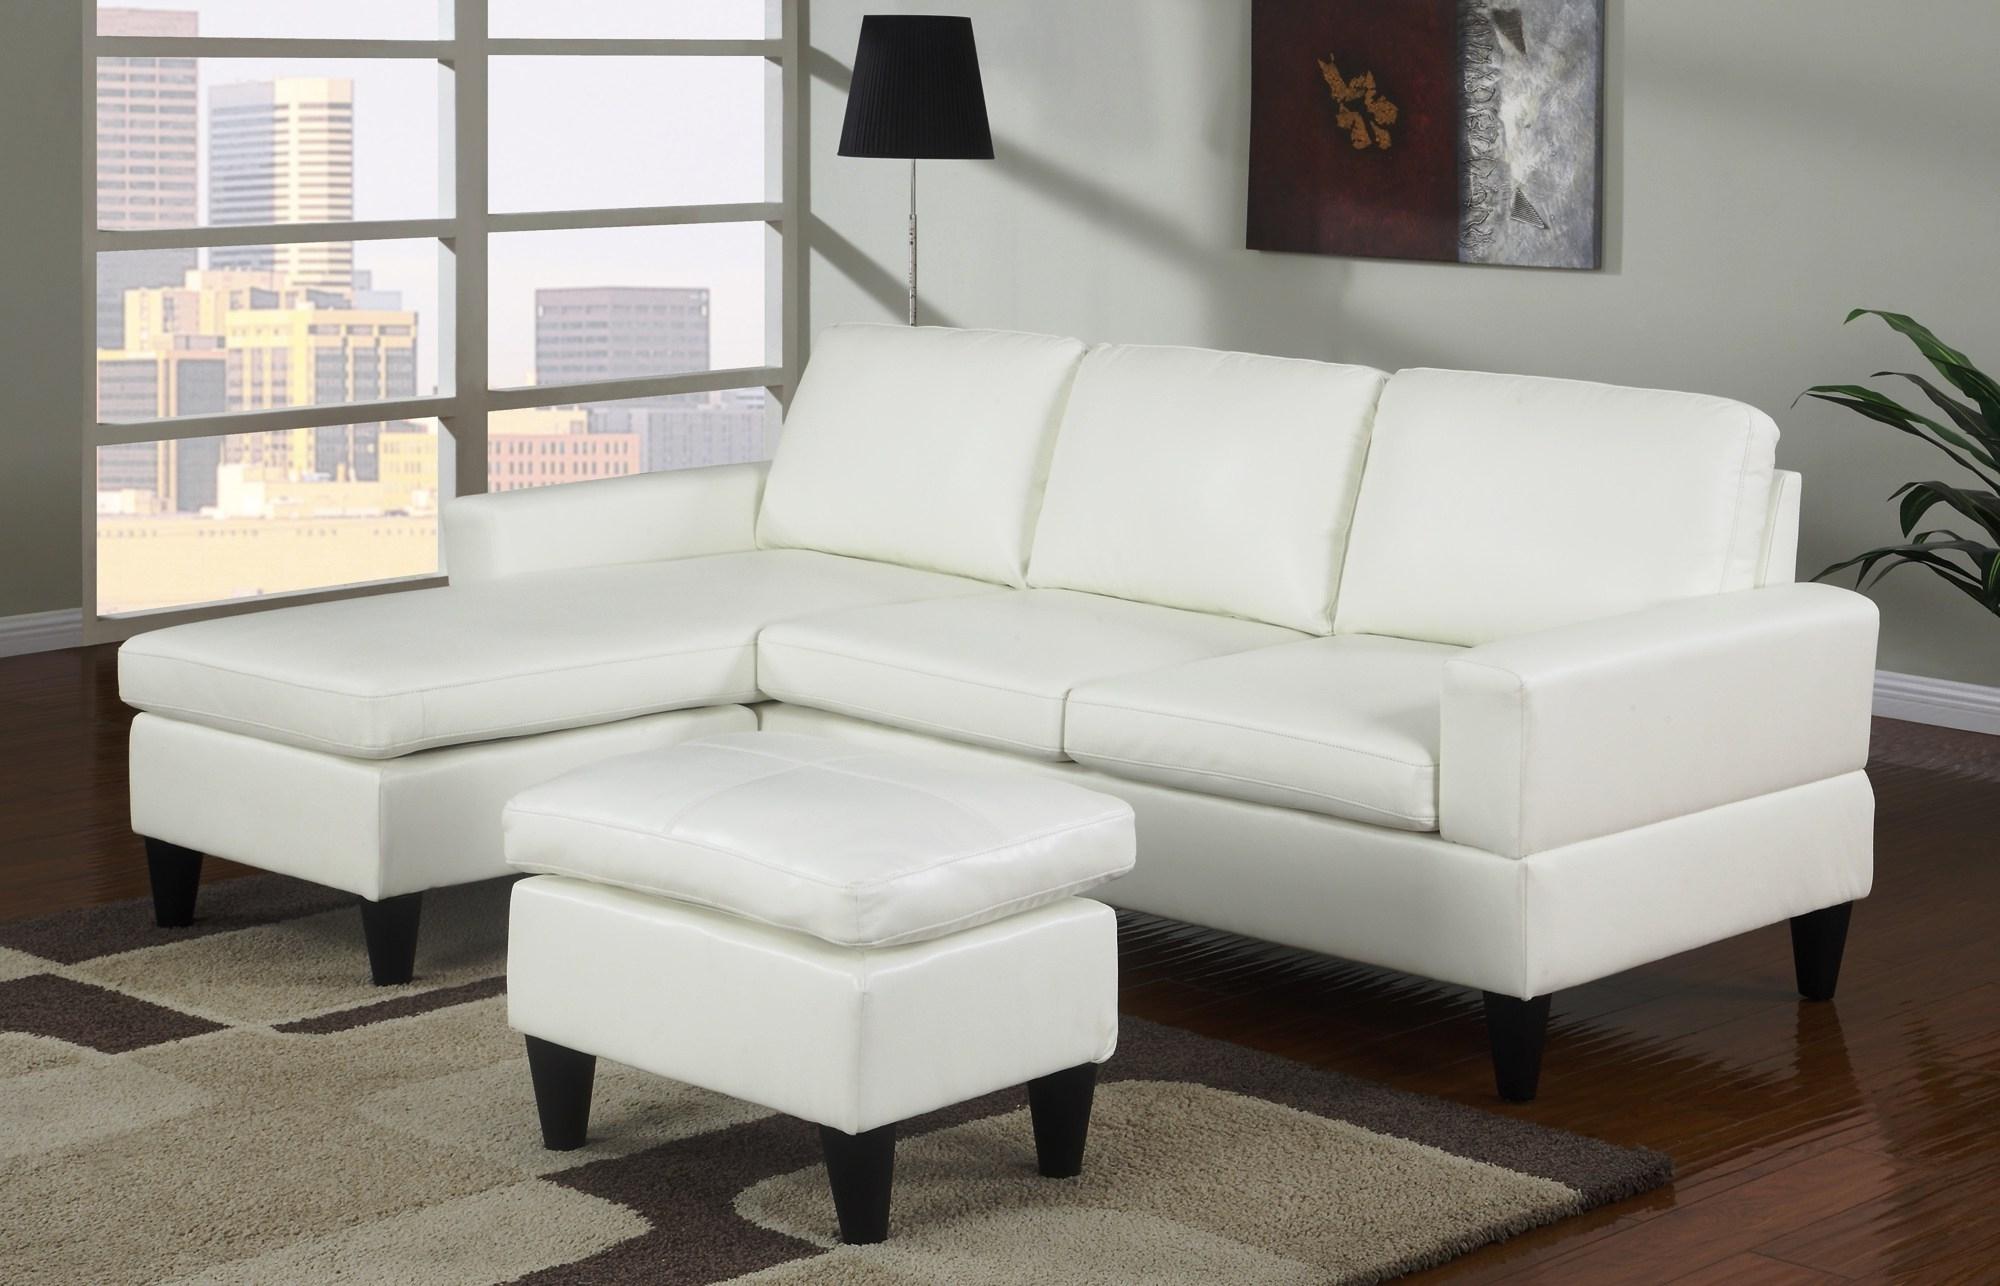 White Leather Corner Sofas For Popular Divani Casa Roslyn Modern White Sofa Leather Linx Set Madrid (View 15 of 20)